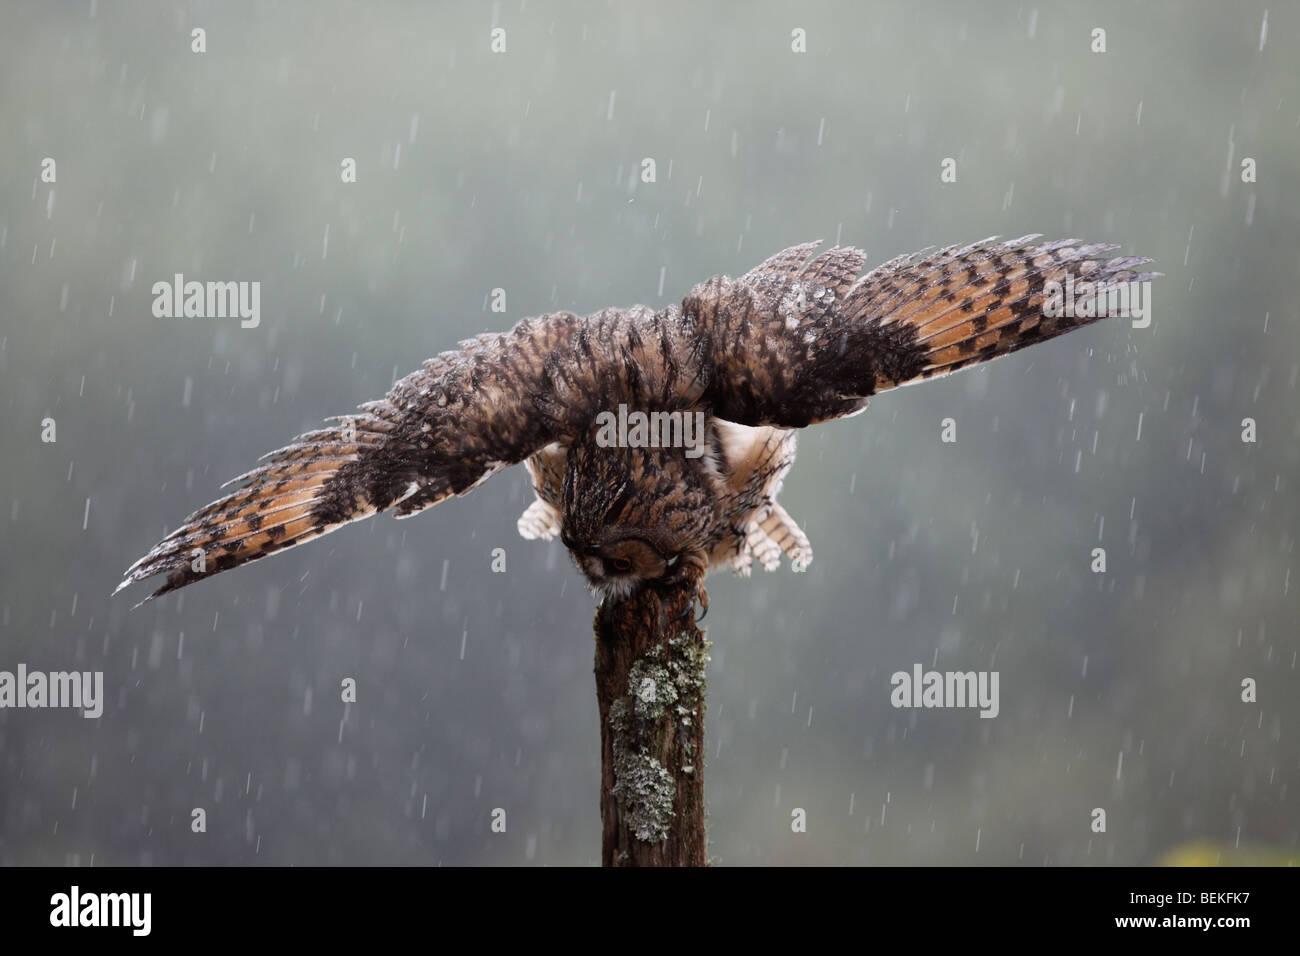 Long eared owl (Asio otus) perching on fence post in rain wings open - Stock Image